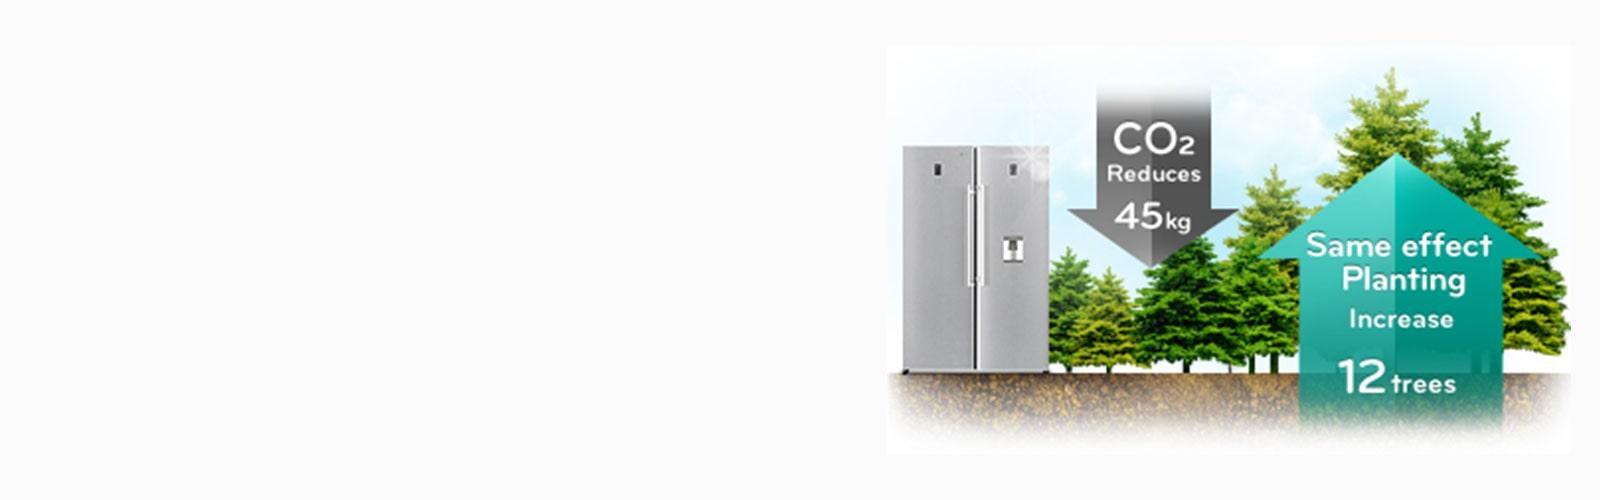 lg-refrigerator-lansen-feature_Eco_Friendly_D